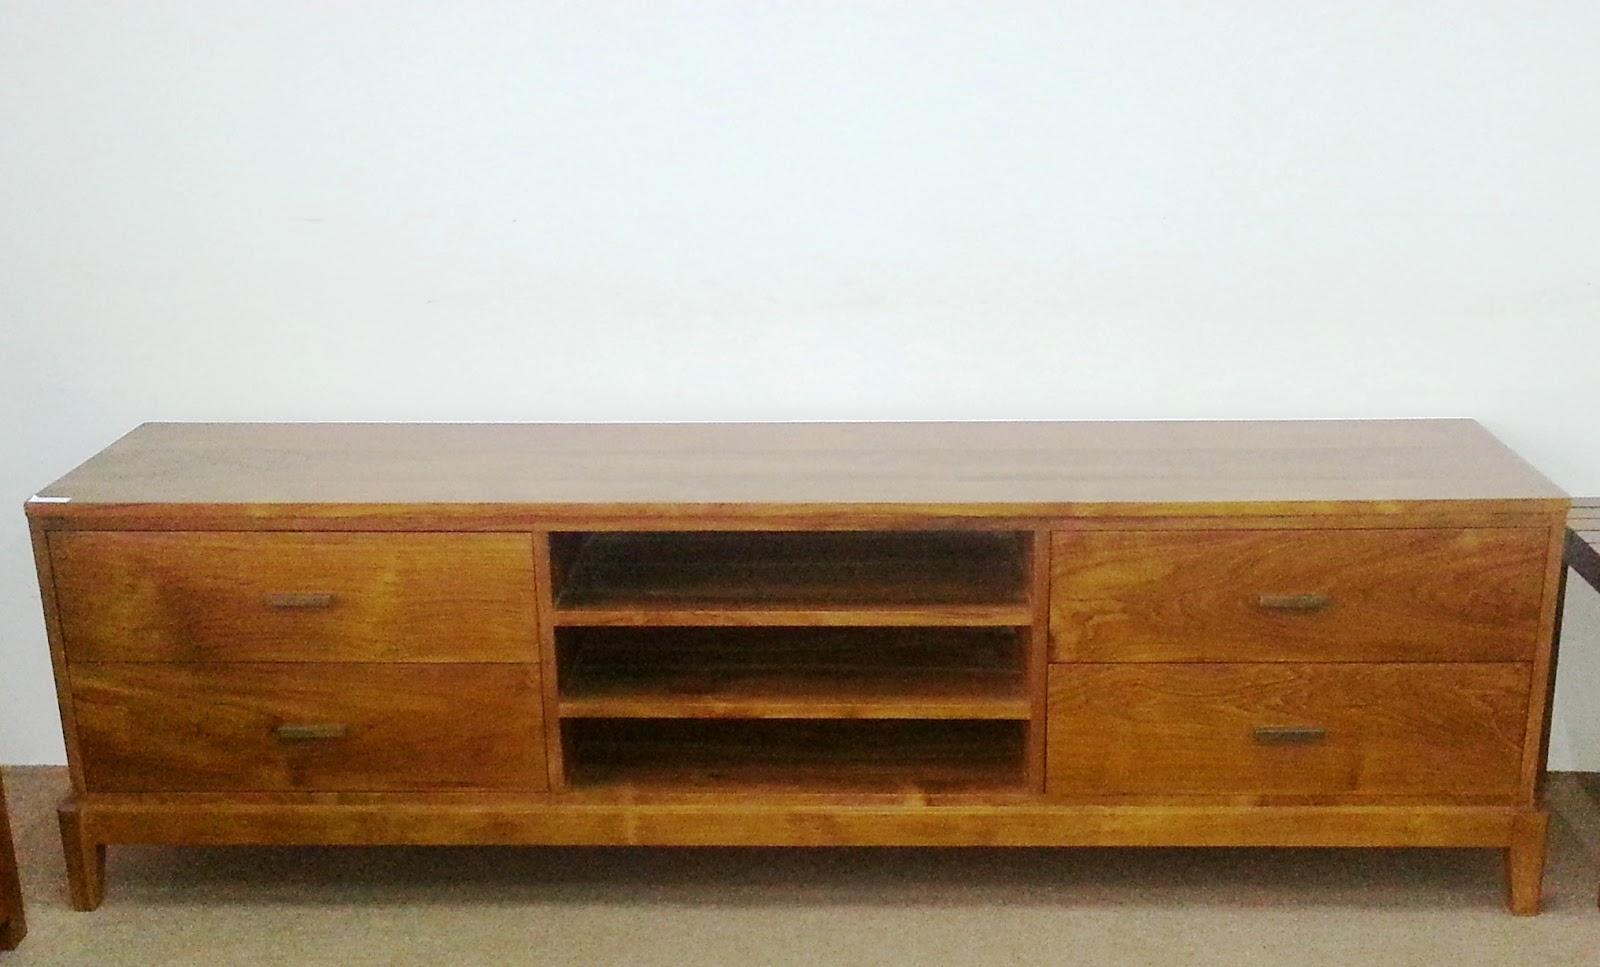 Teak Wood Home Furniture And Outdoor Wicker Garden Furniture Supplier In Malaysia Teak Wood Tv